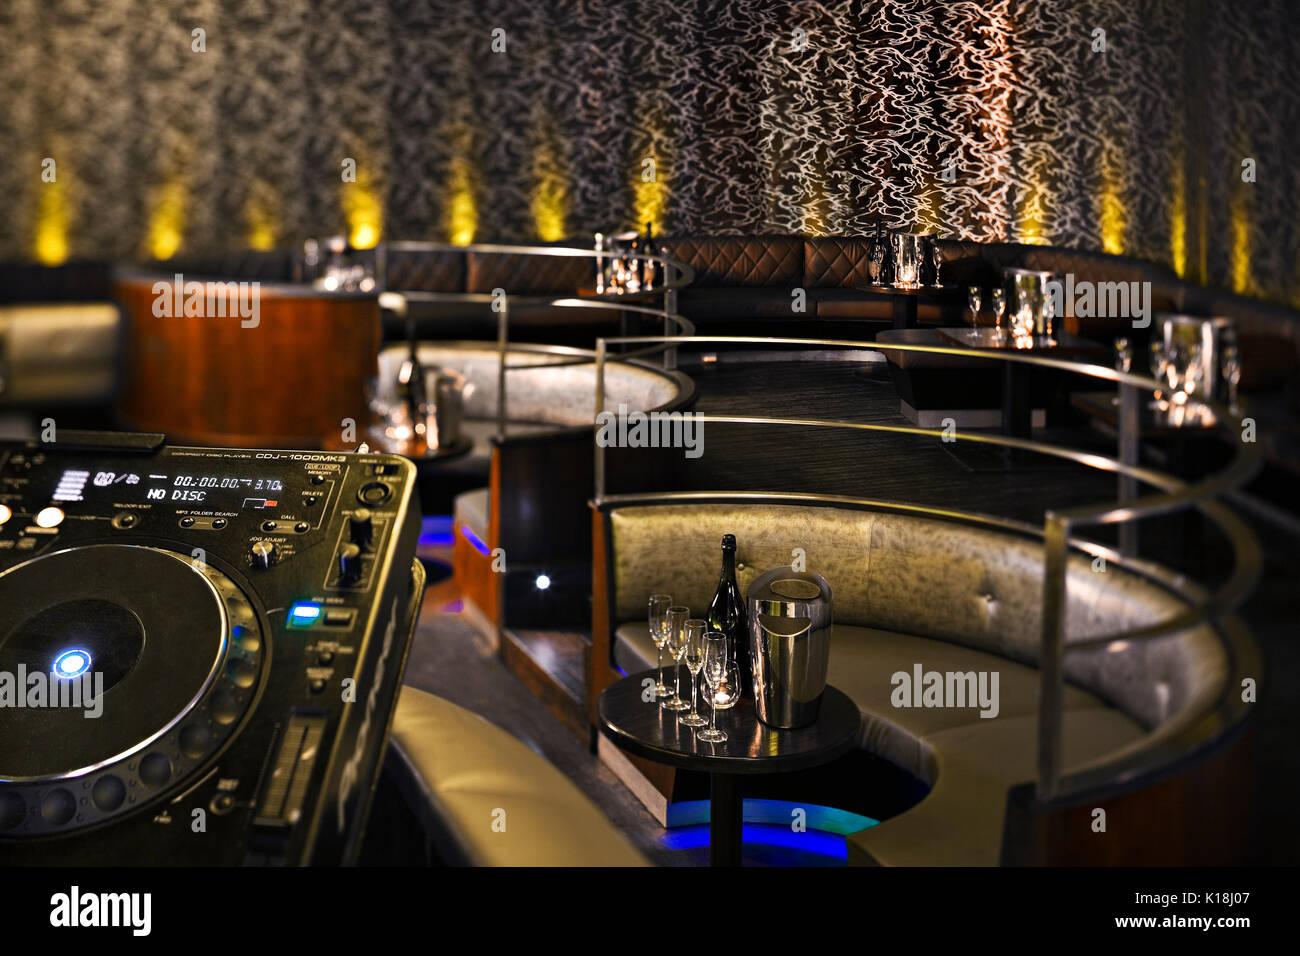 London Nightclub Stock Photo